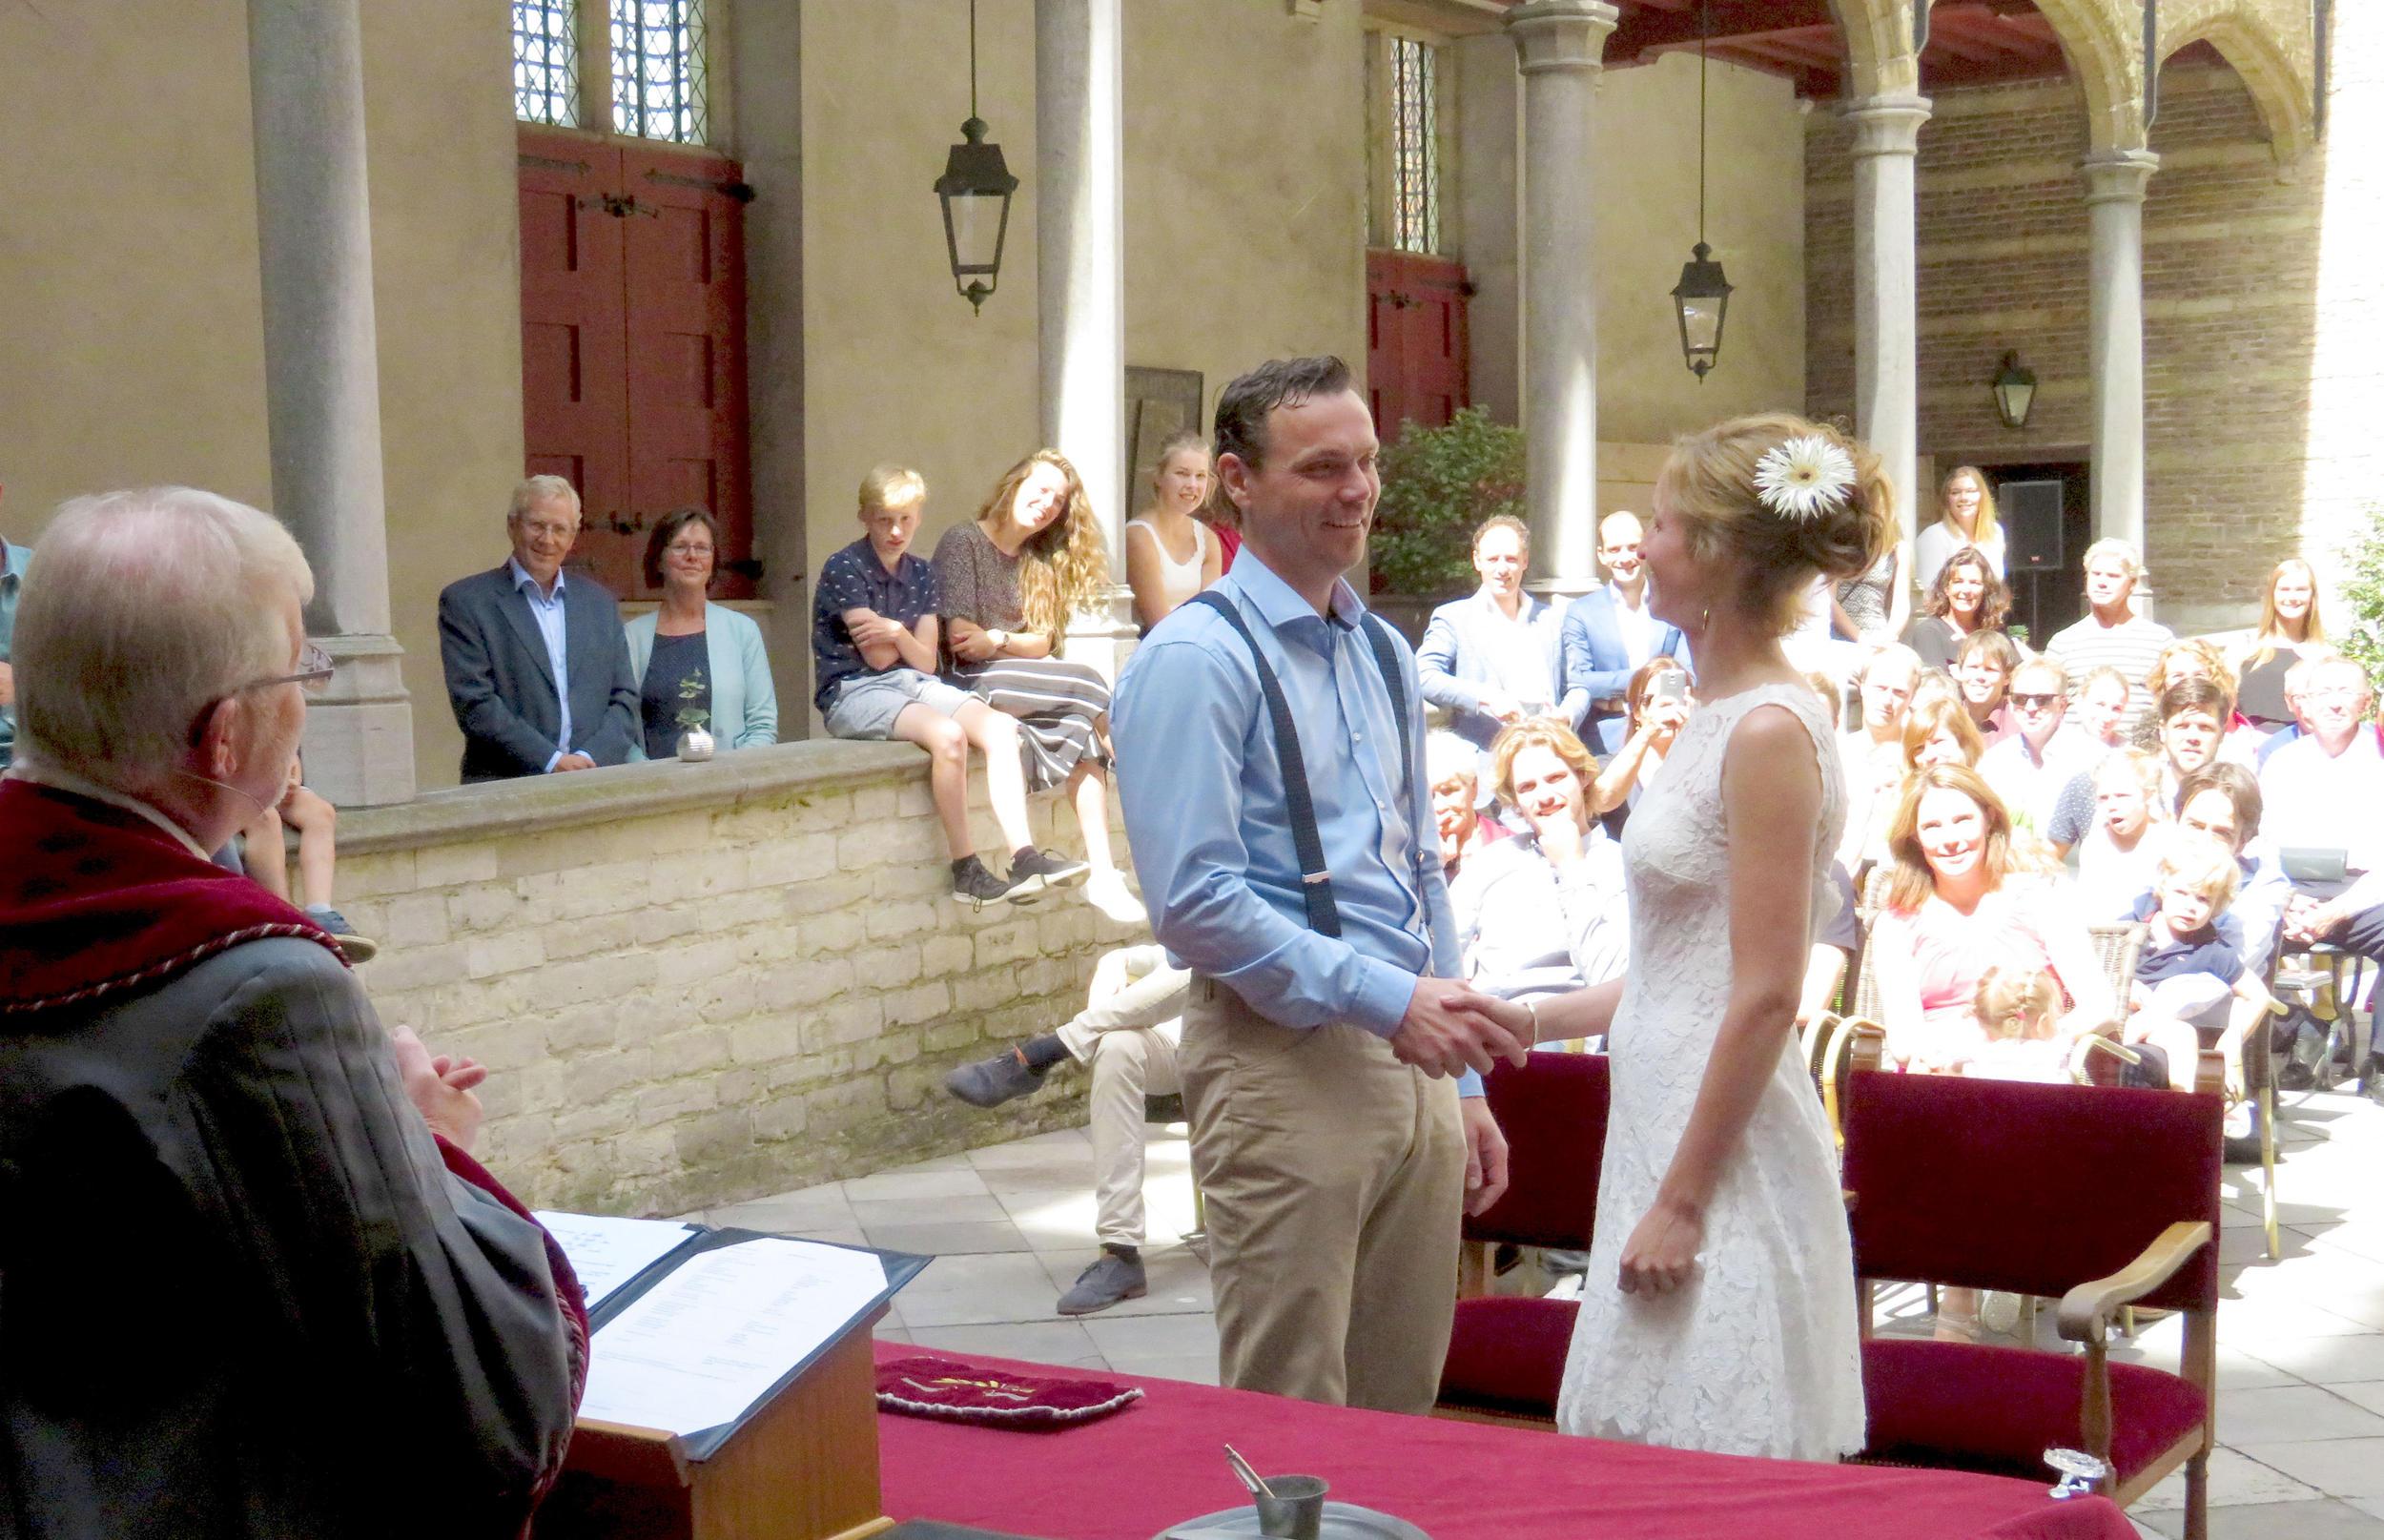 Bruiloft Kleine Binnenplaats